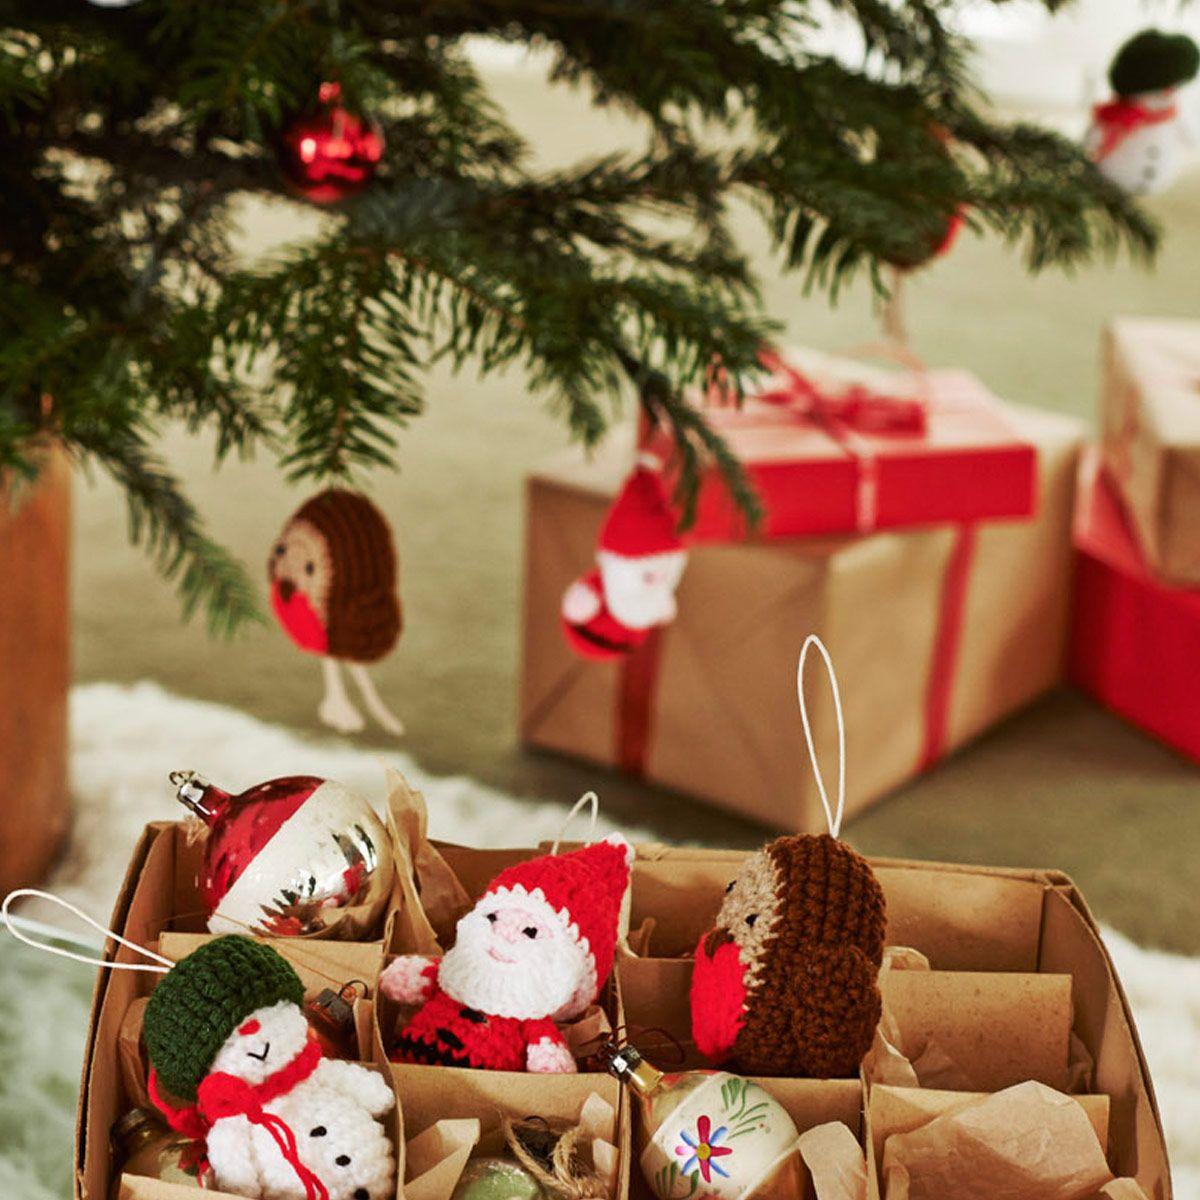 Decorate the christmas tree fa la la la - Set Of 3 Santa Snowman Robin Crocheted Decorations Christmas Decorations Cathkidston